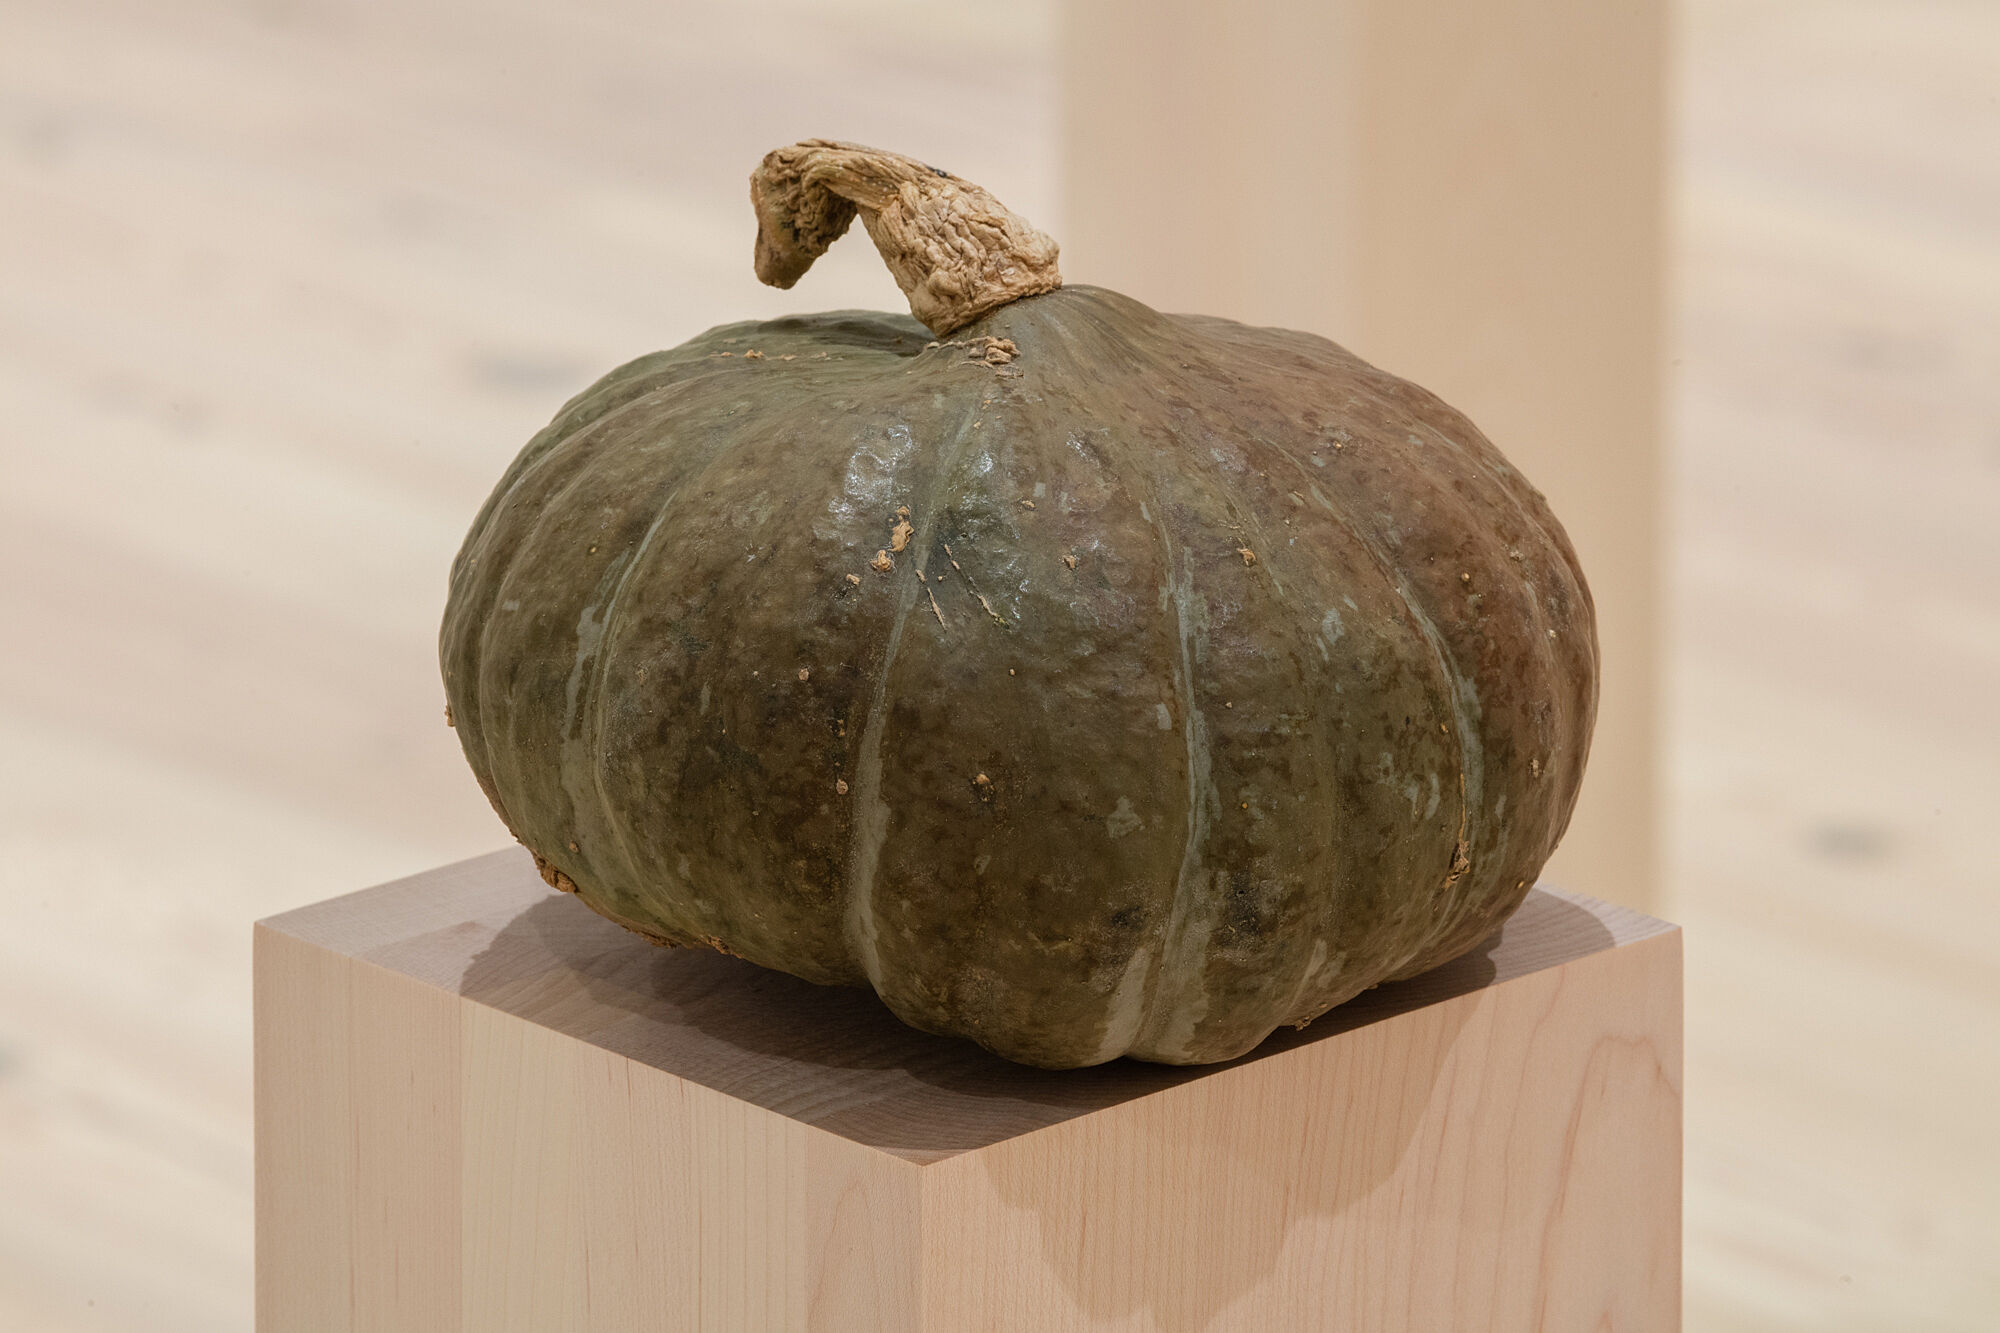 A photo of a kobocha squash on a plinth.